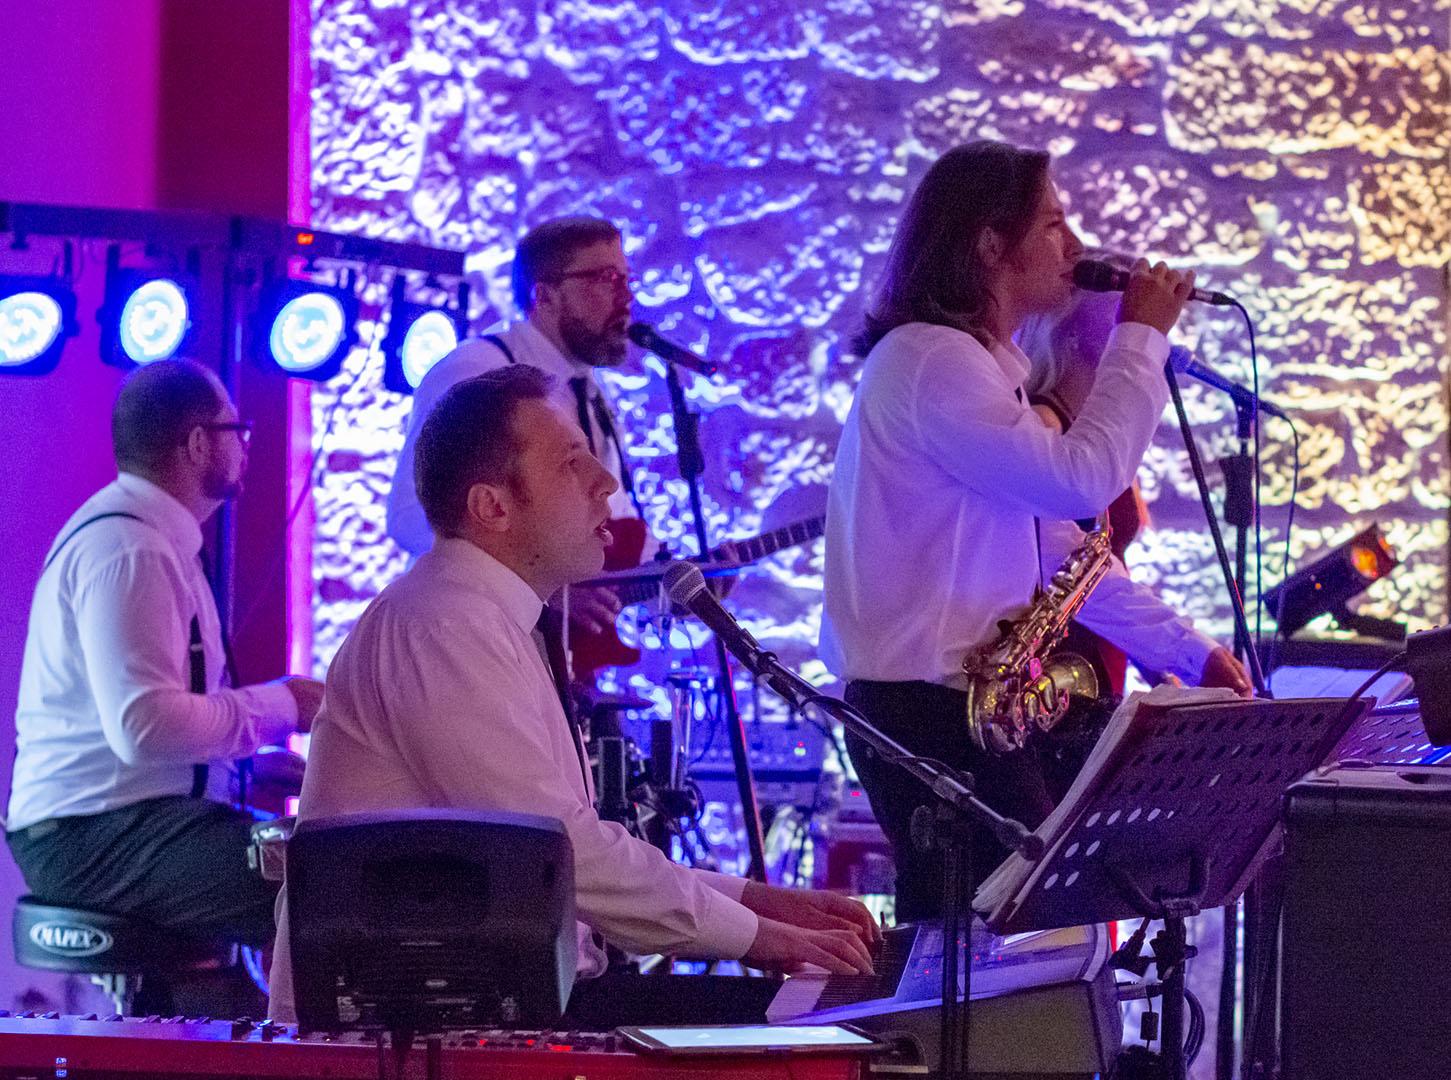 Band singing and playing